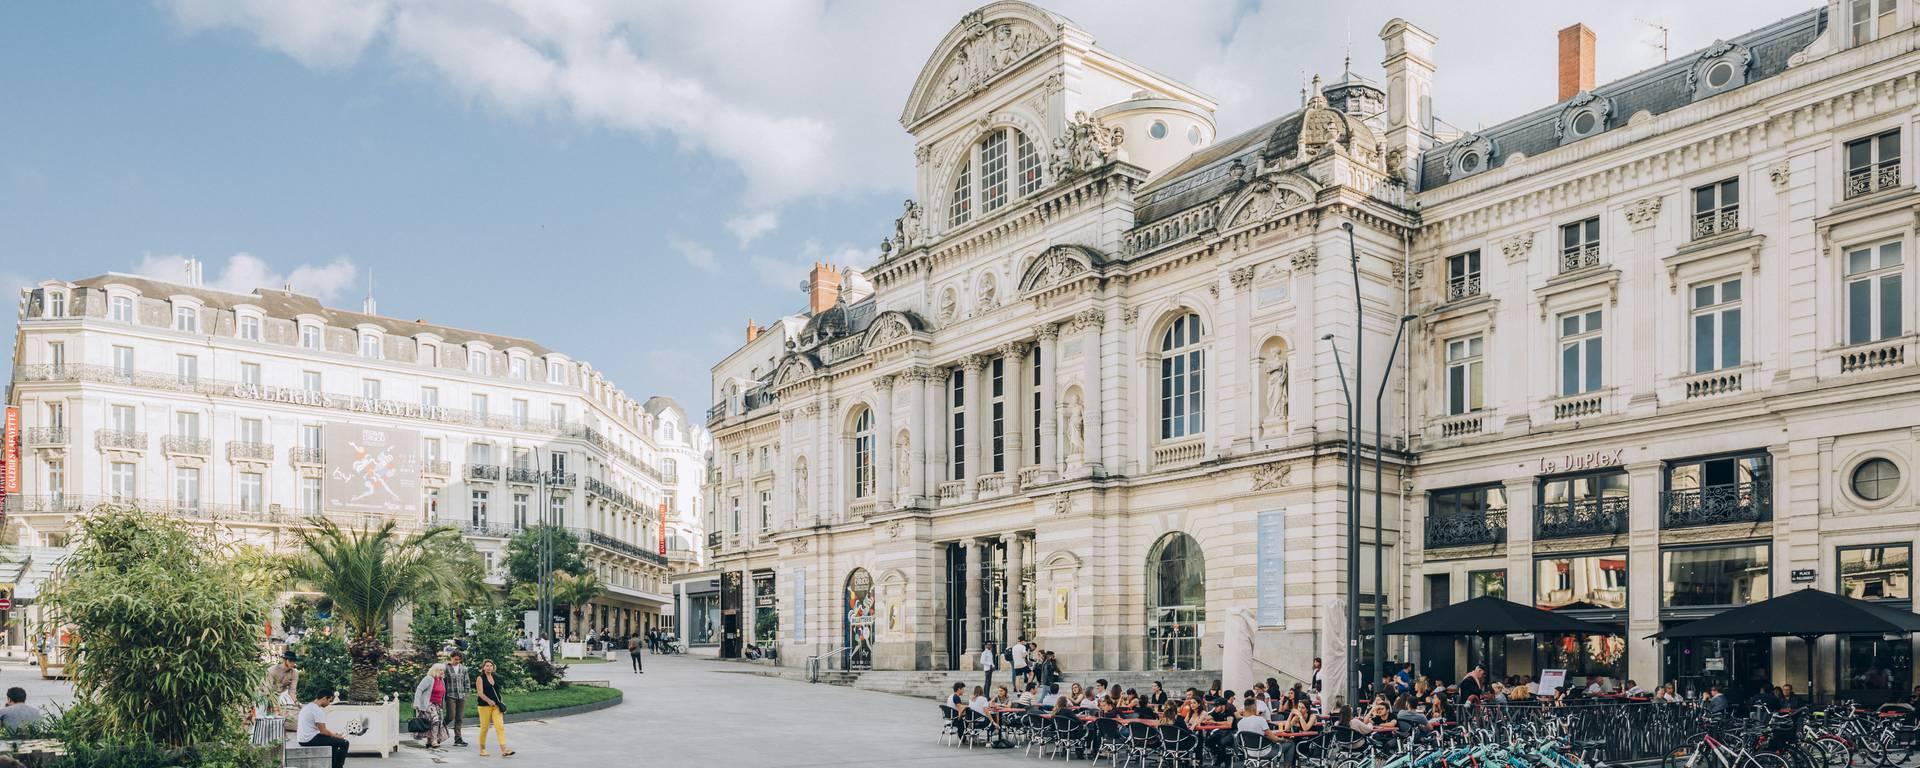 Grand théâtre d'Angers, place du Ralliement © Romain Bassenne